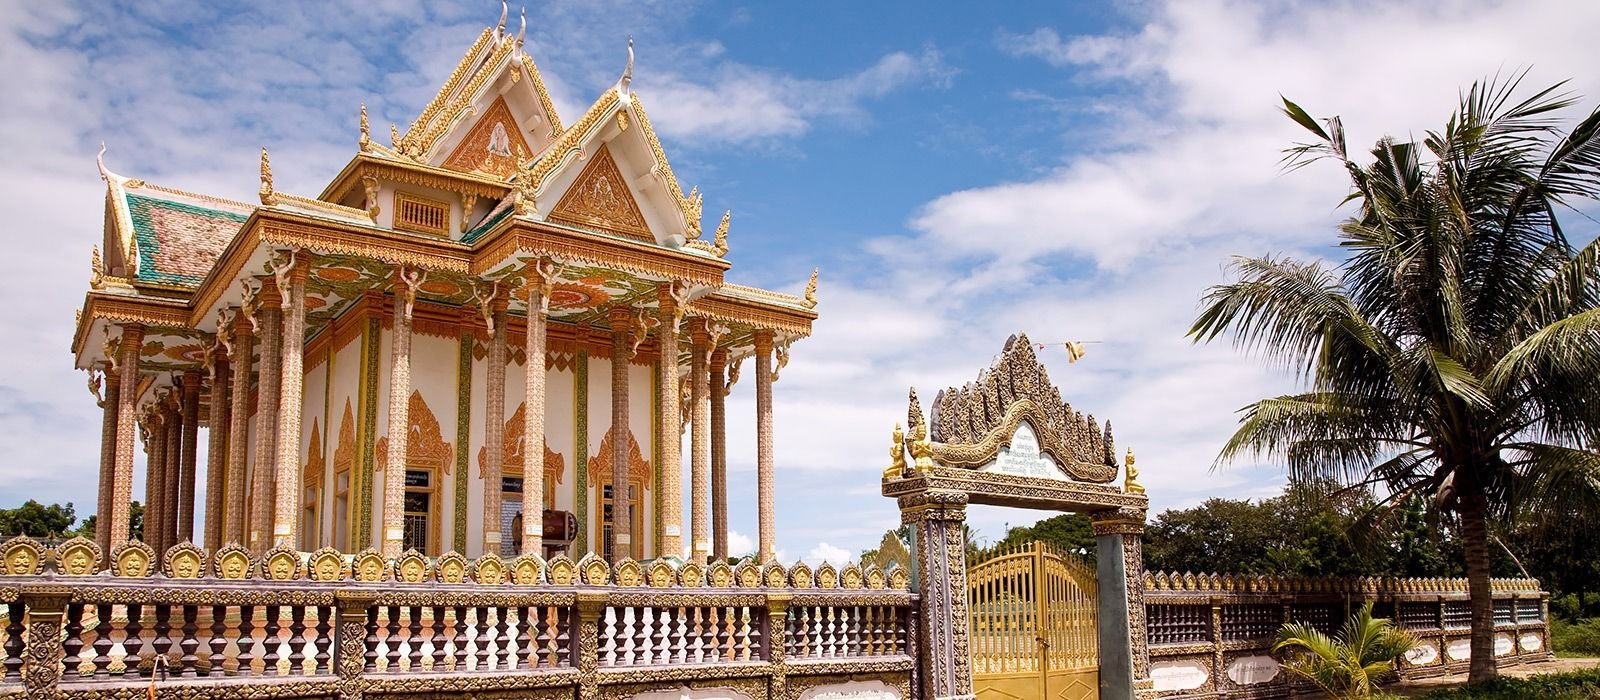 Reiseziel Battambang Kambodscha